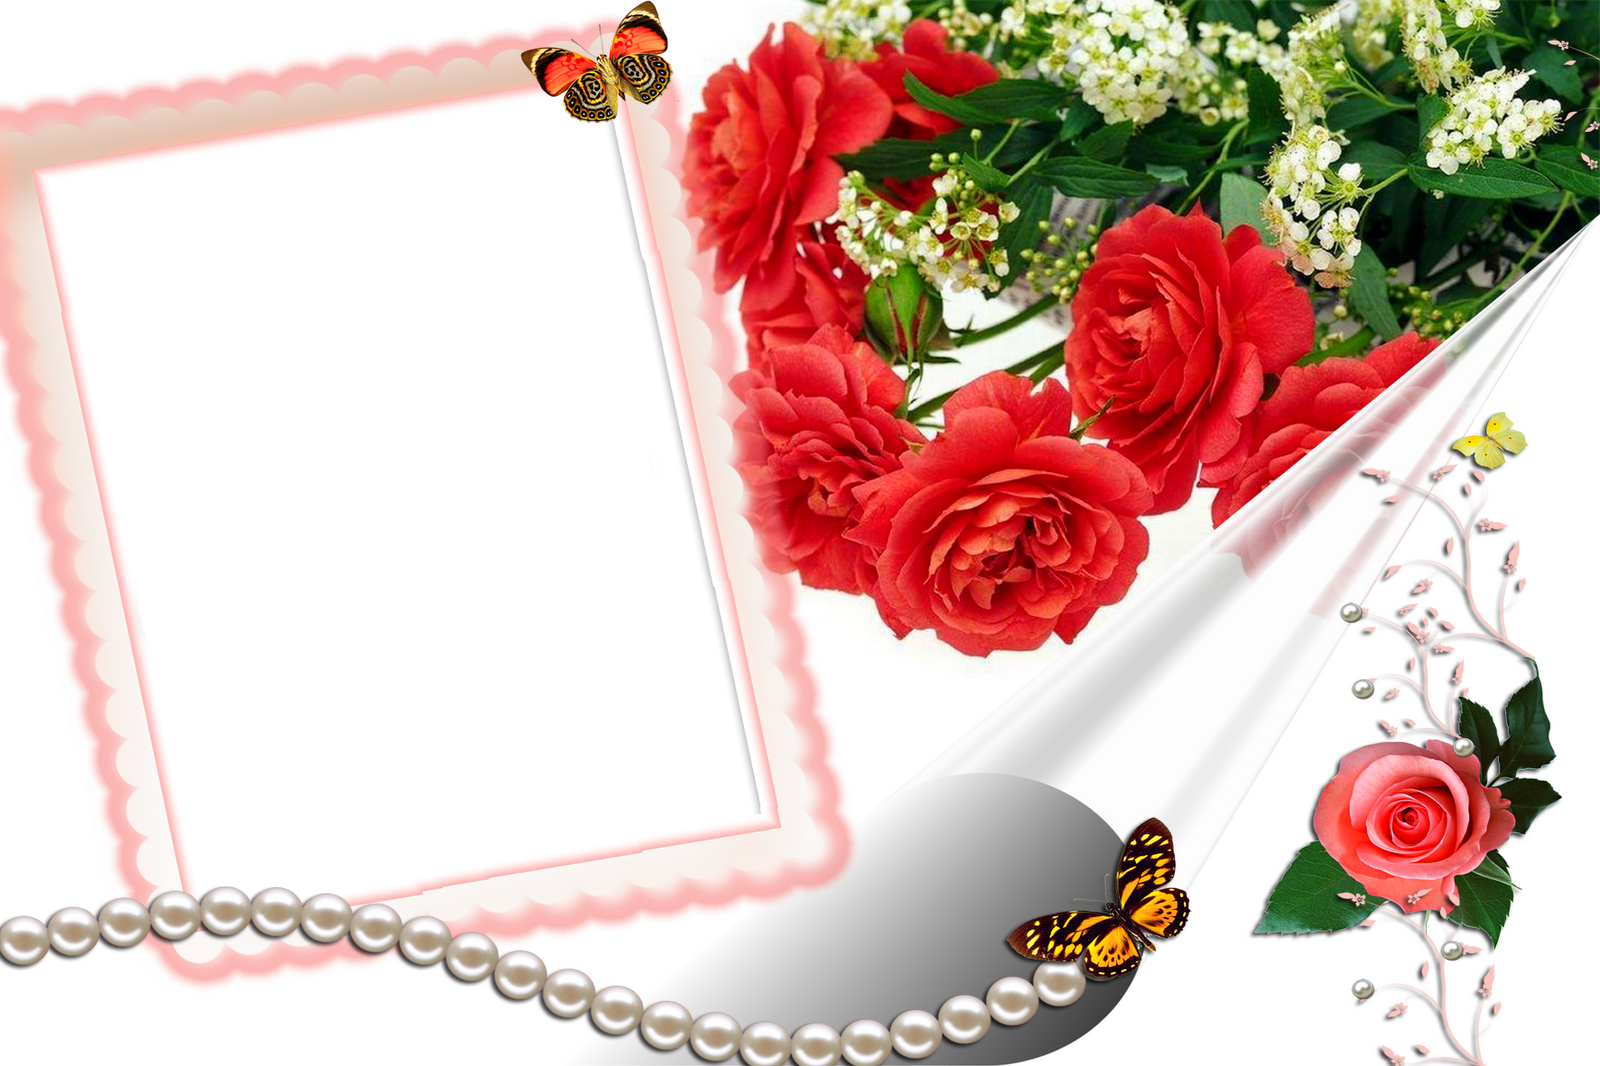 Love Frame Png Transparent Images 1293: SOLO POWERPOINTS: MARCOS PARA FOTOS SAN VALENTIN